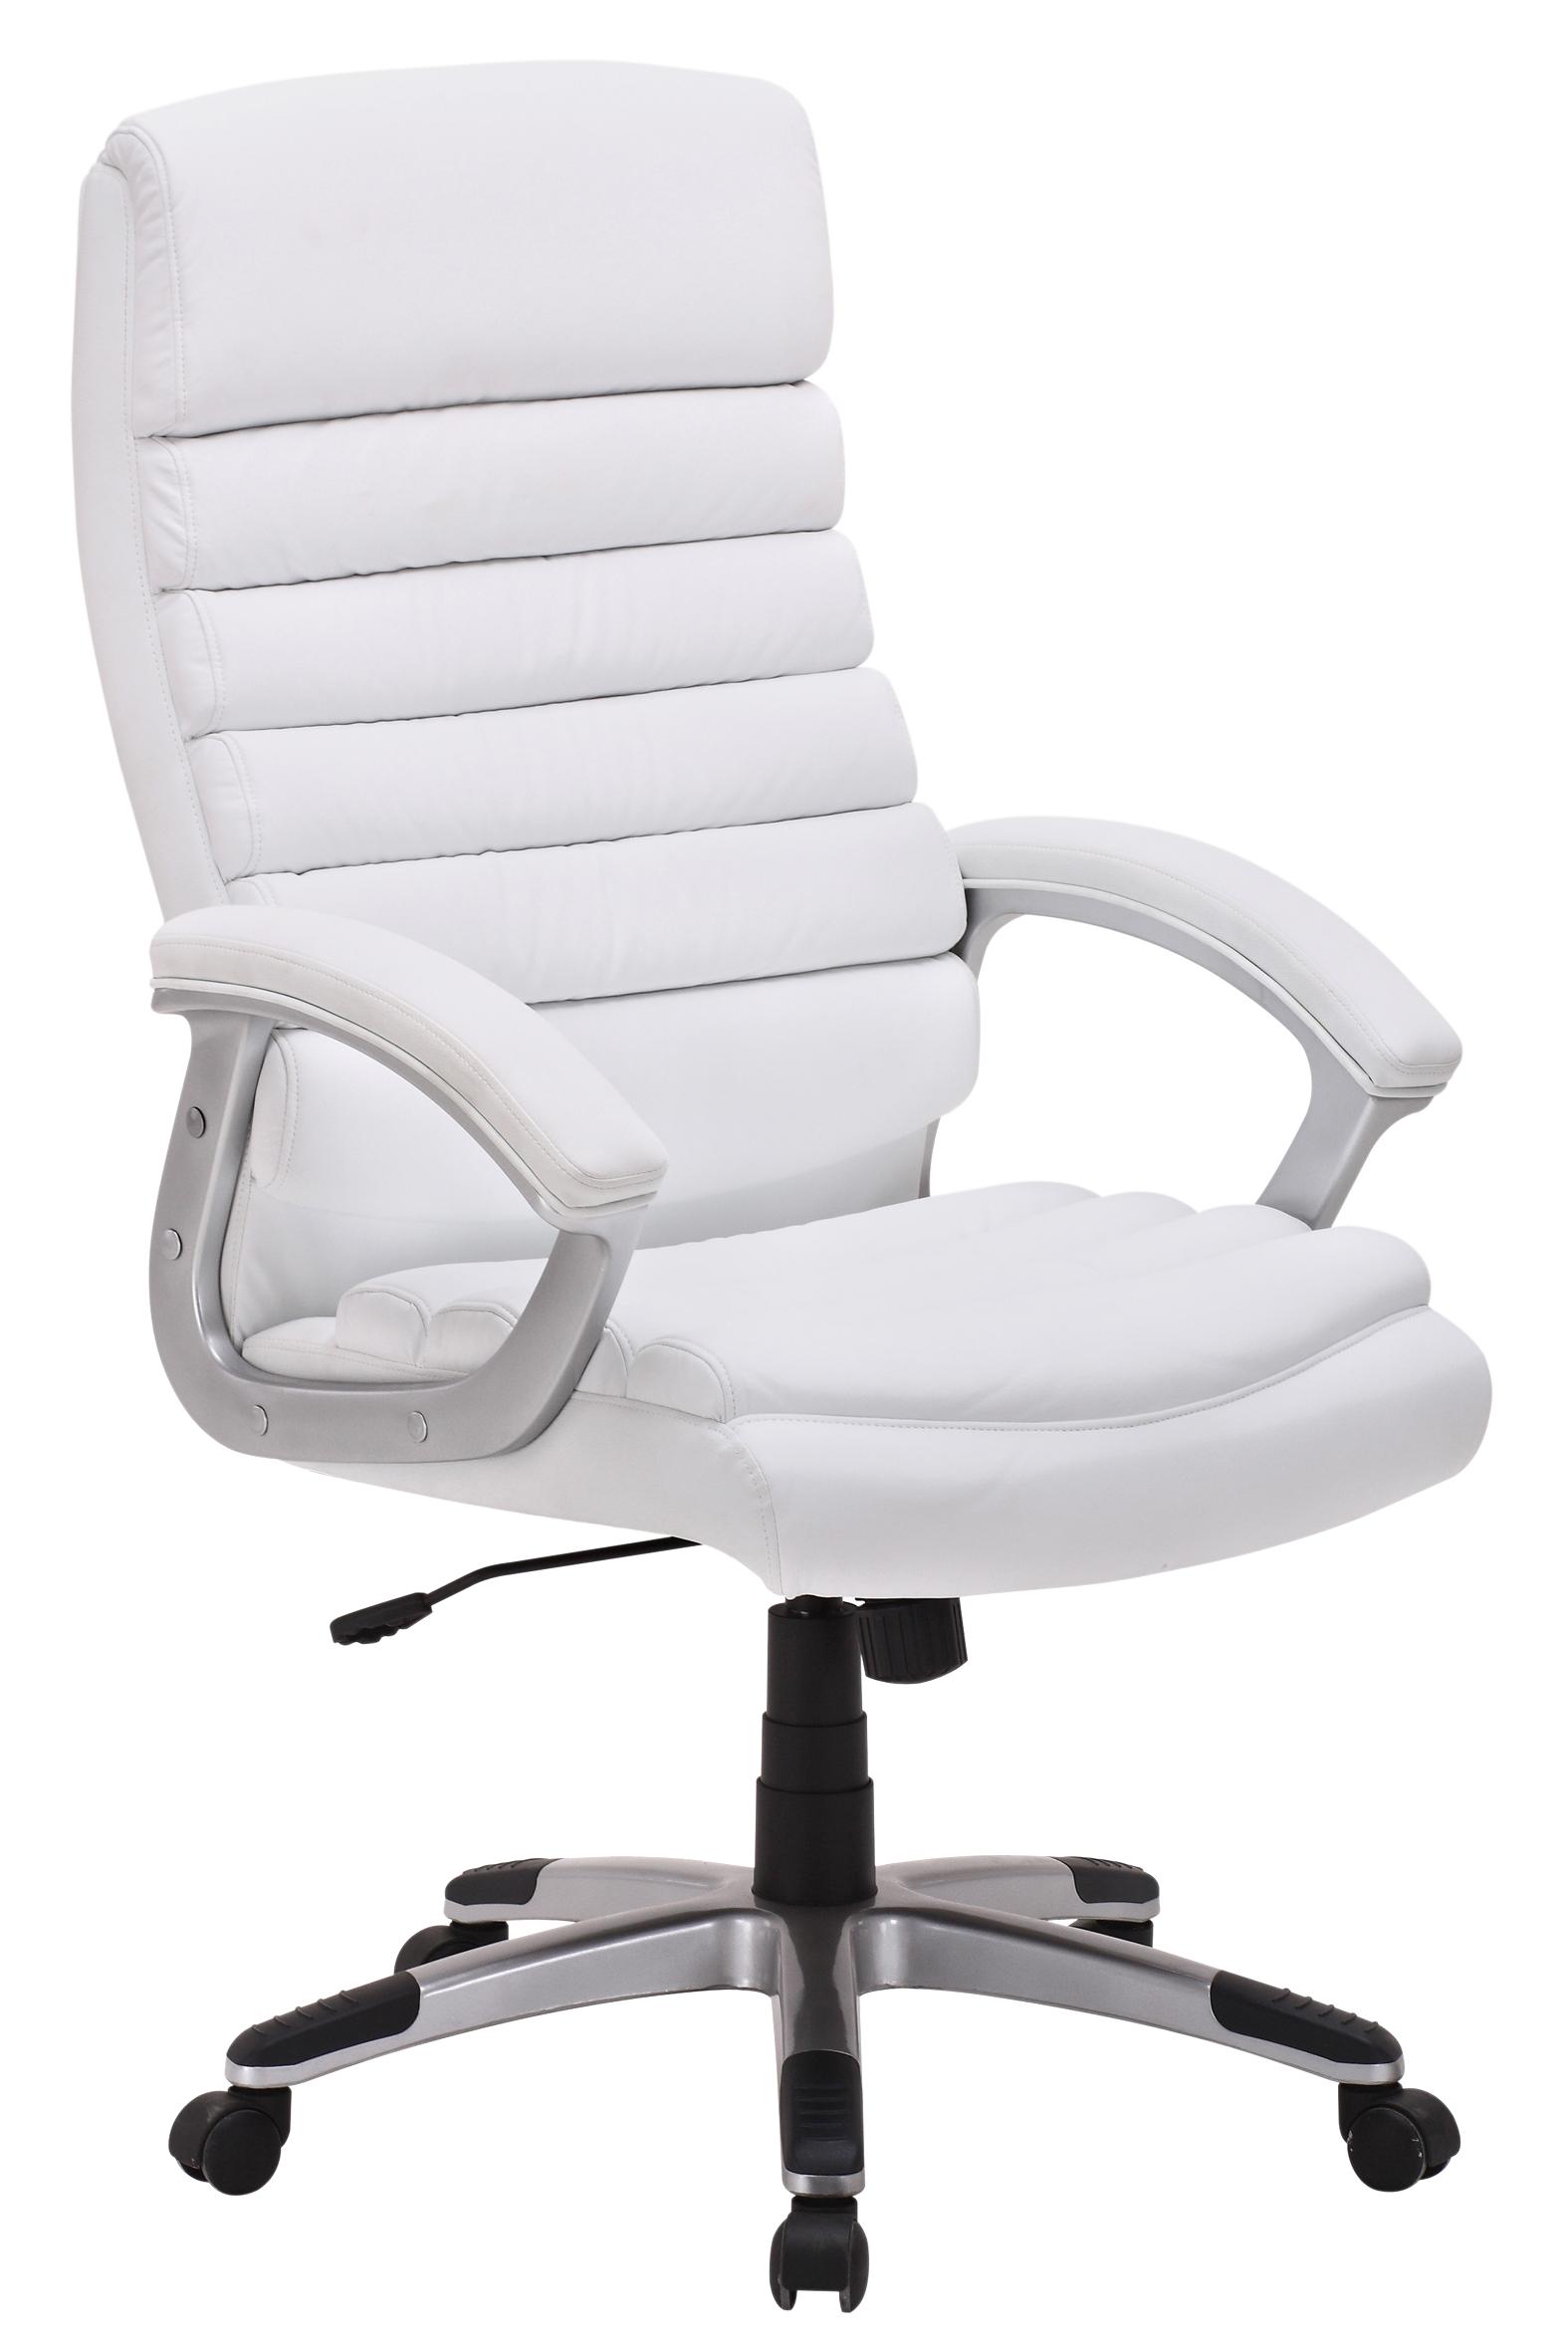 Chaise de bureau kennedy pu blanc for Meuble belgica tongres